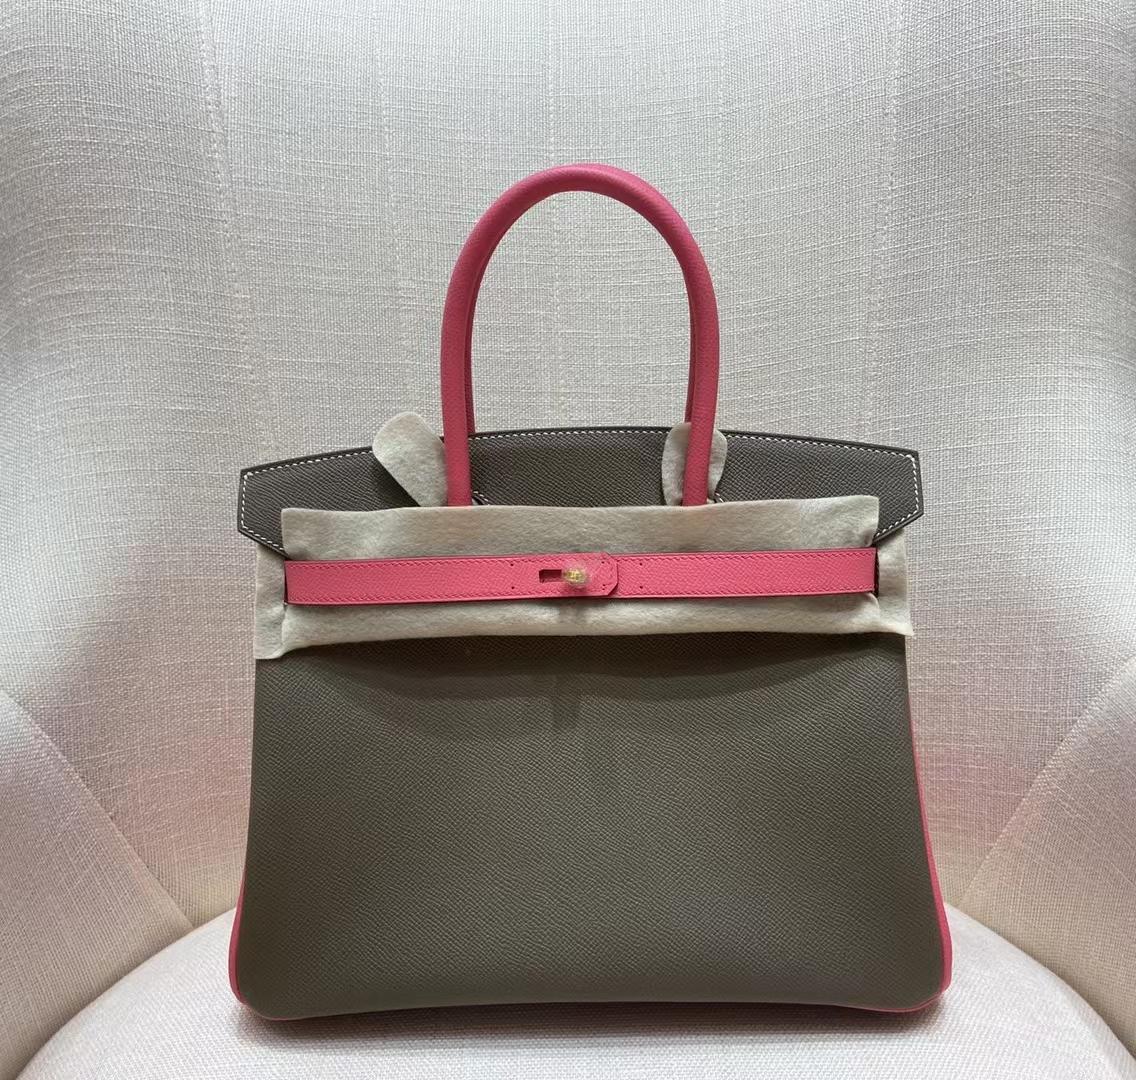 Hermès(爱马仕)birkin 铂金包 Epsom 大象灰拼唇膏粉 30cm 金扣 顶级纯手工 现货